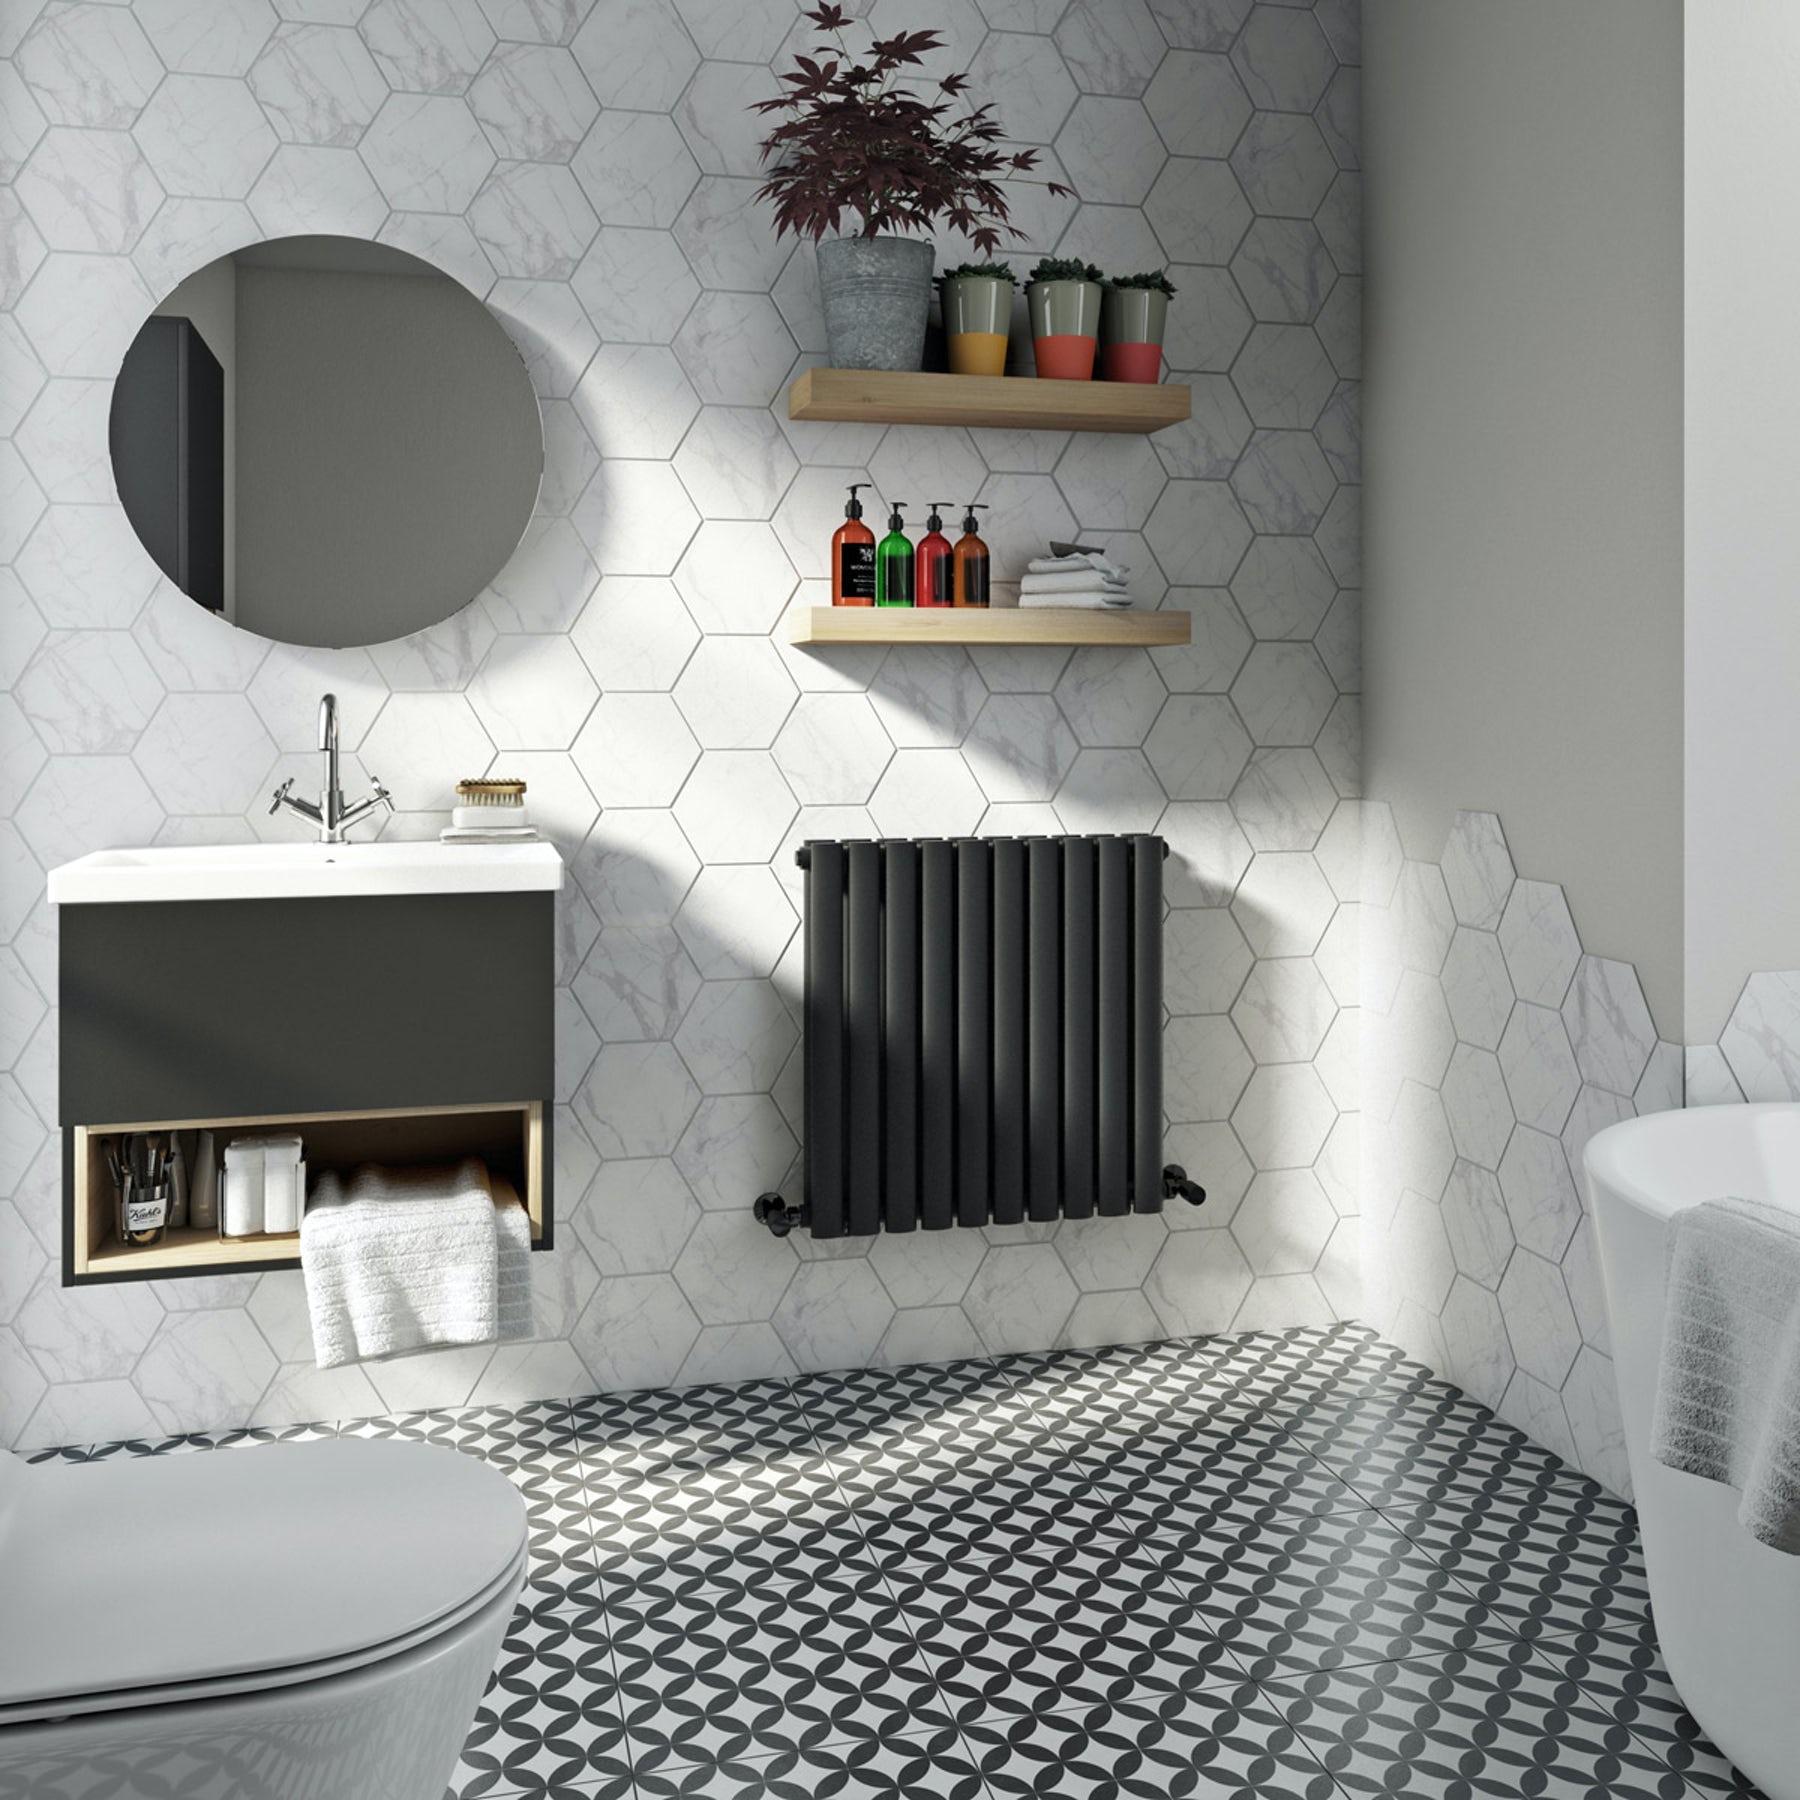 The Heating Co. Salvador anthracite grey double horizontal radiator